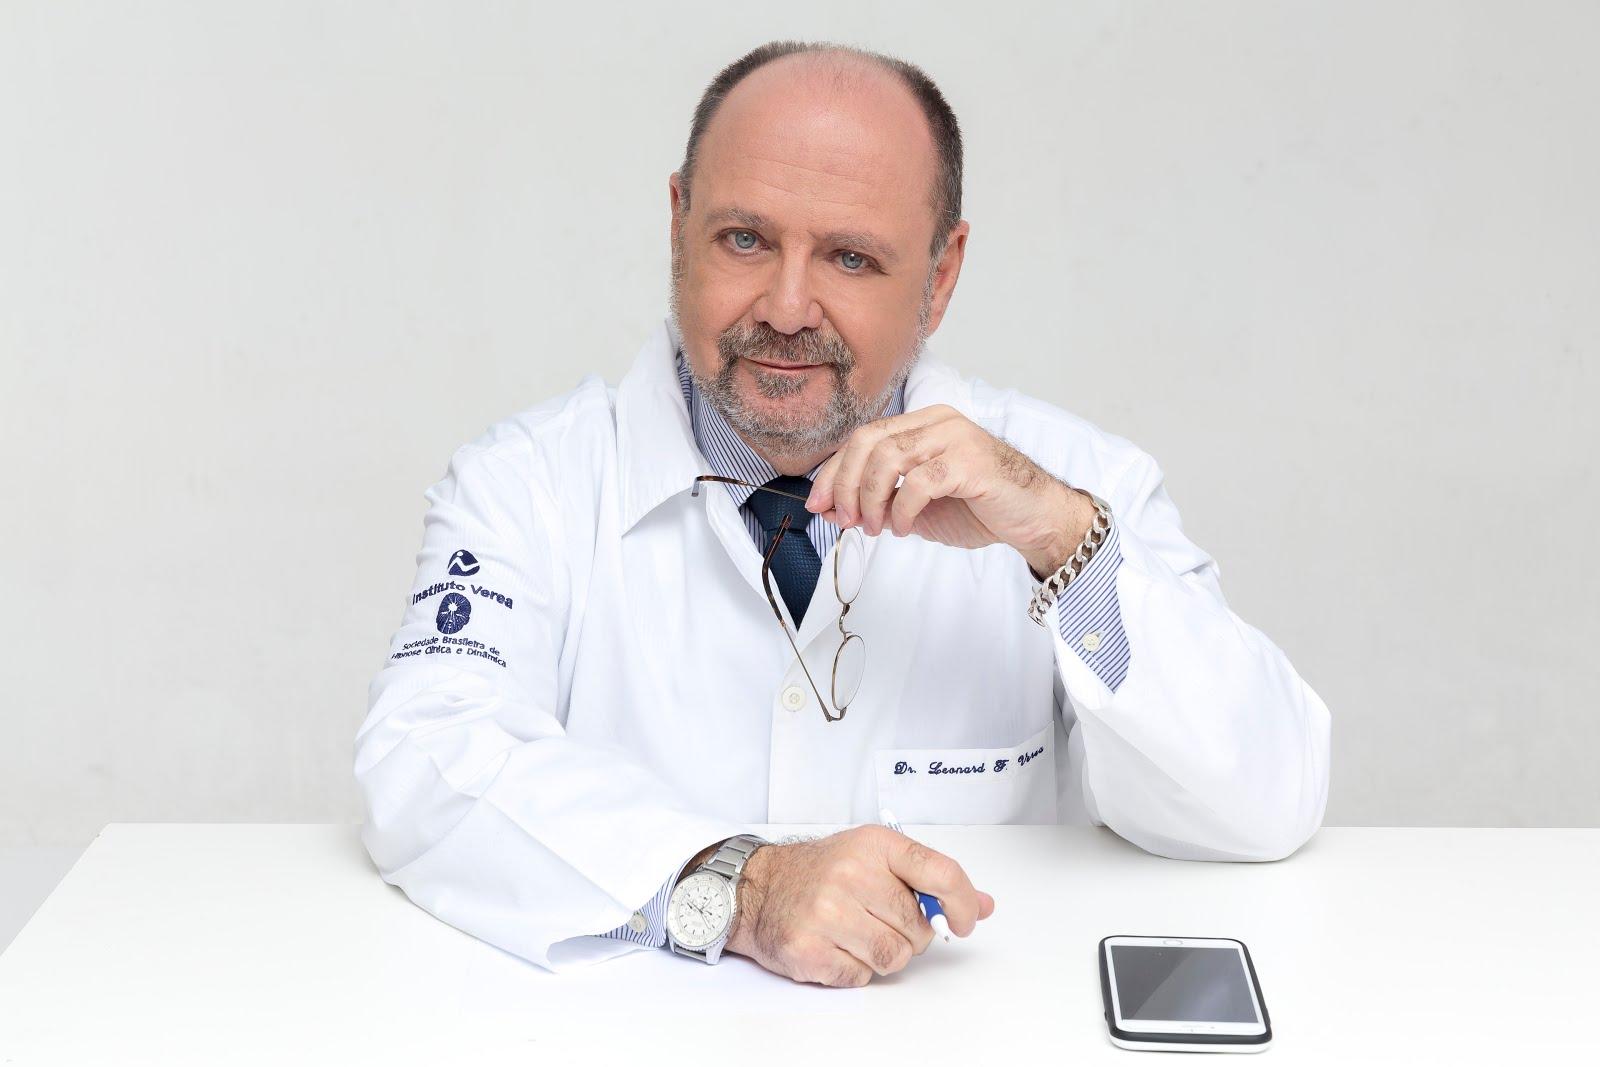 Dr. Leonard Verea